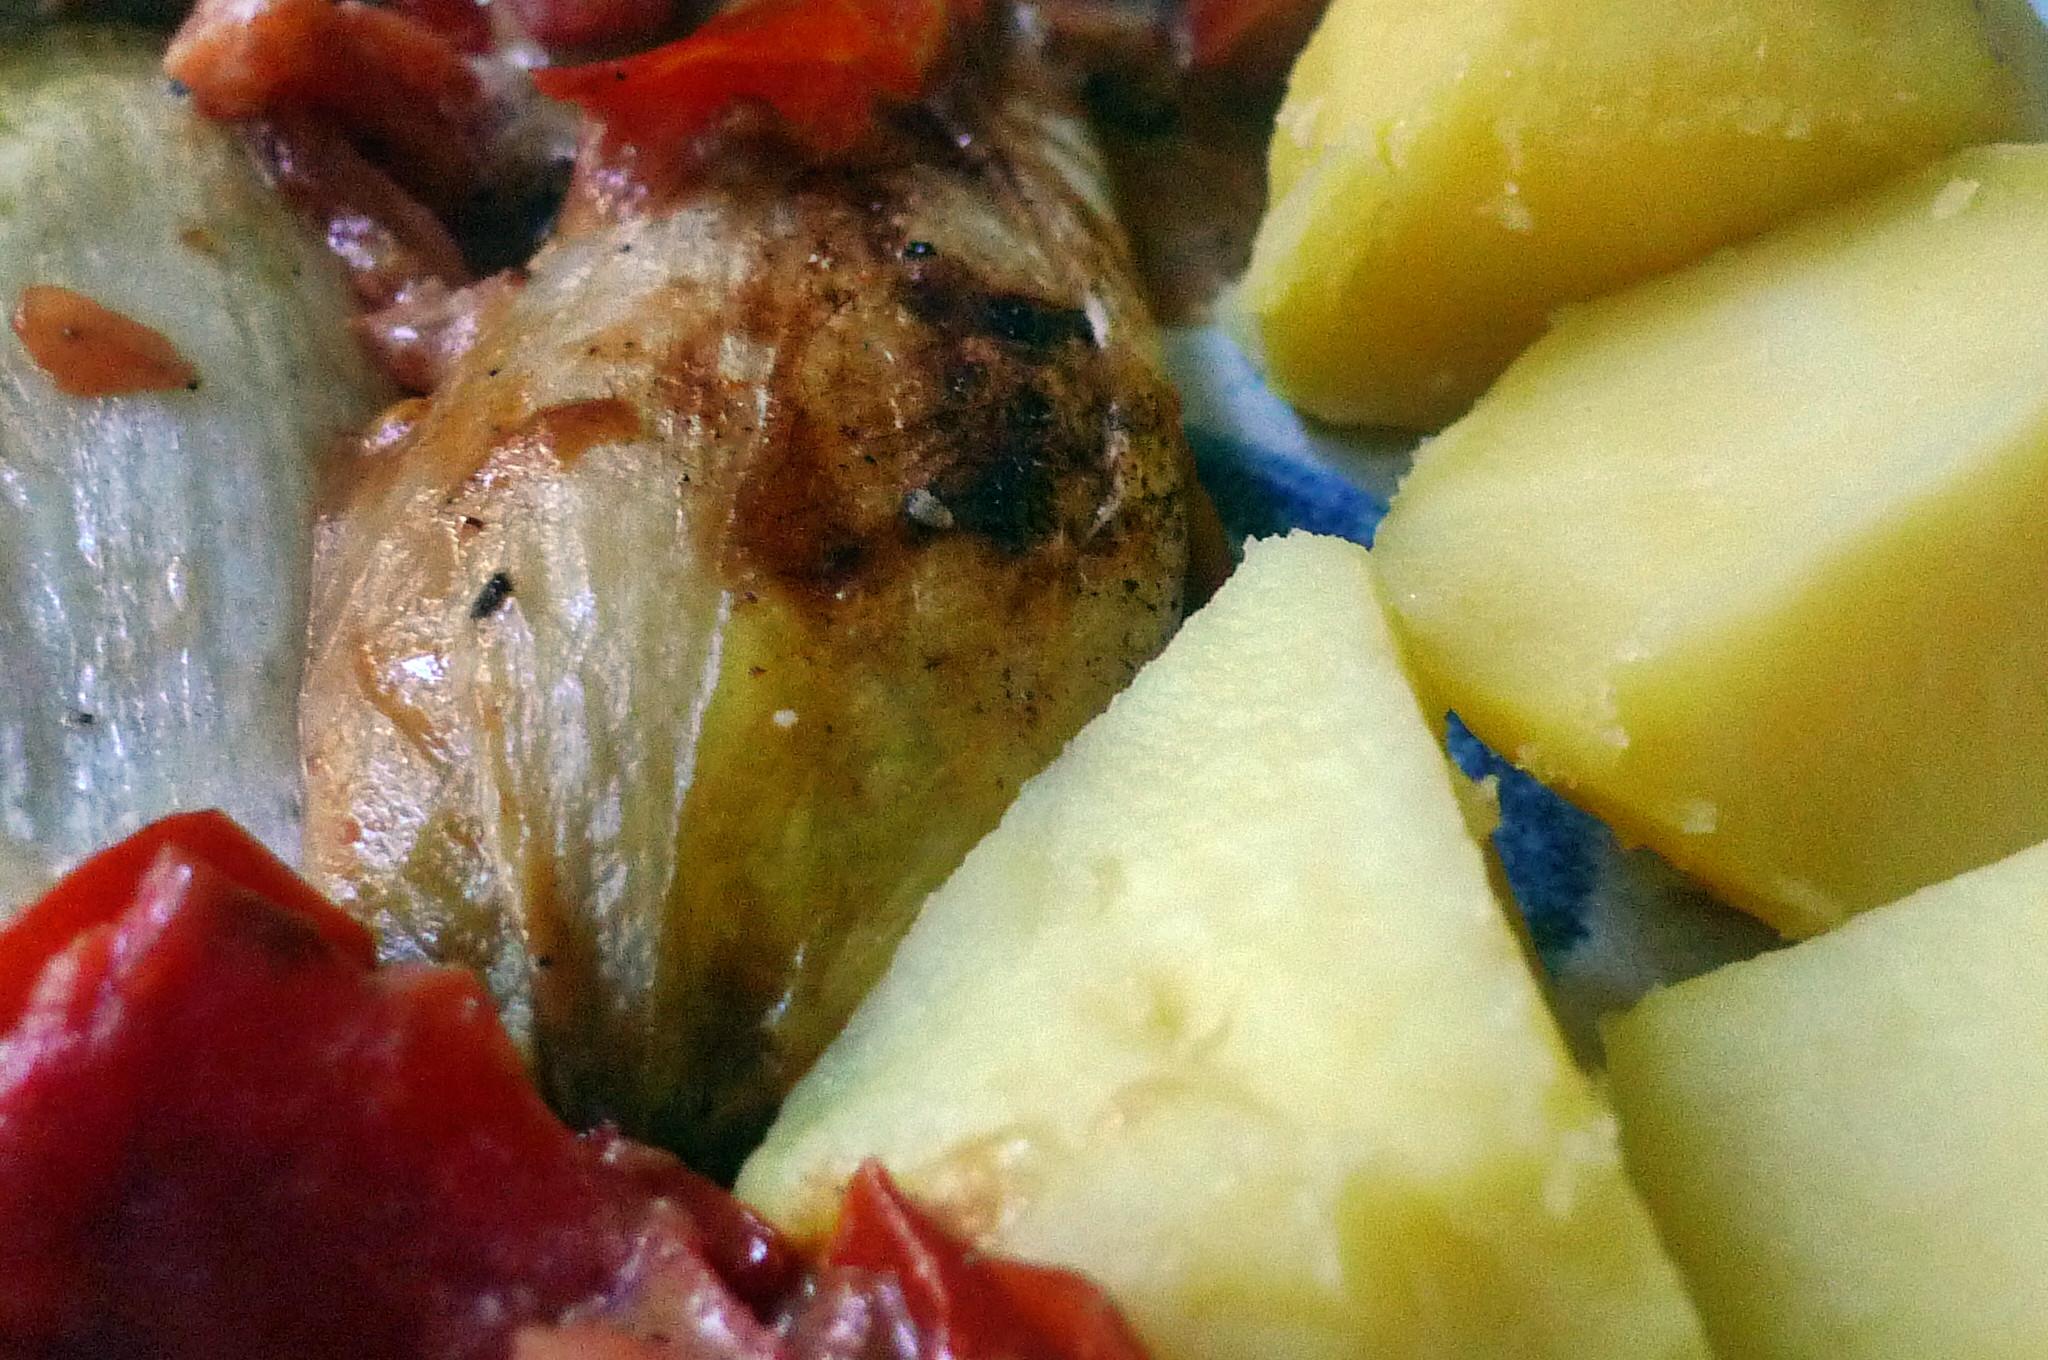 Chicoree,Salzkartoffeln,Pflaumenkompott,vegetarisch - 28.2.15   (11)